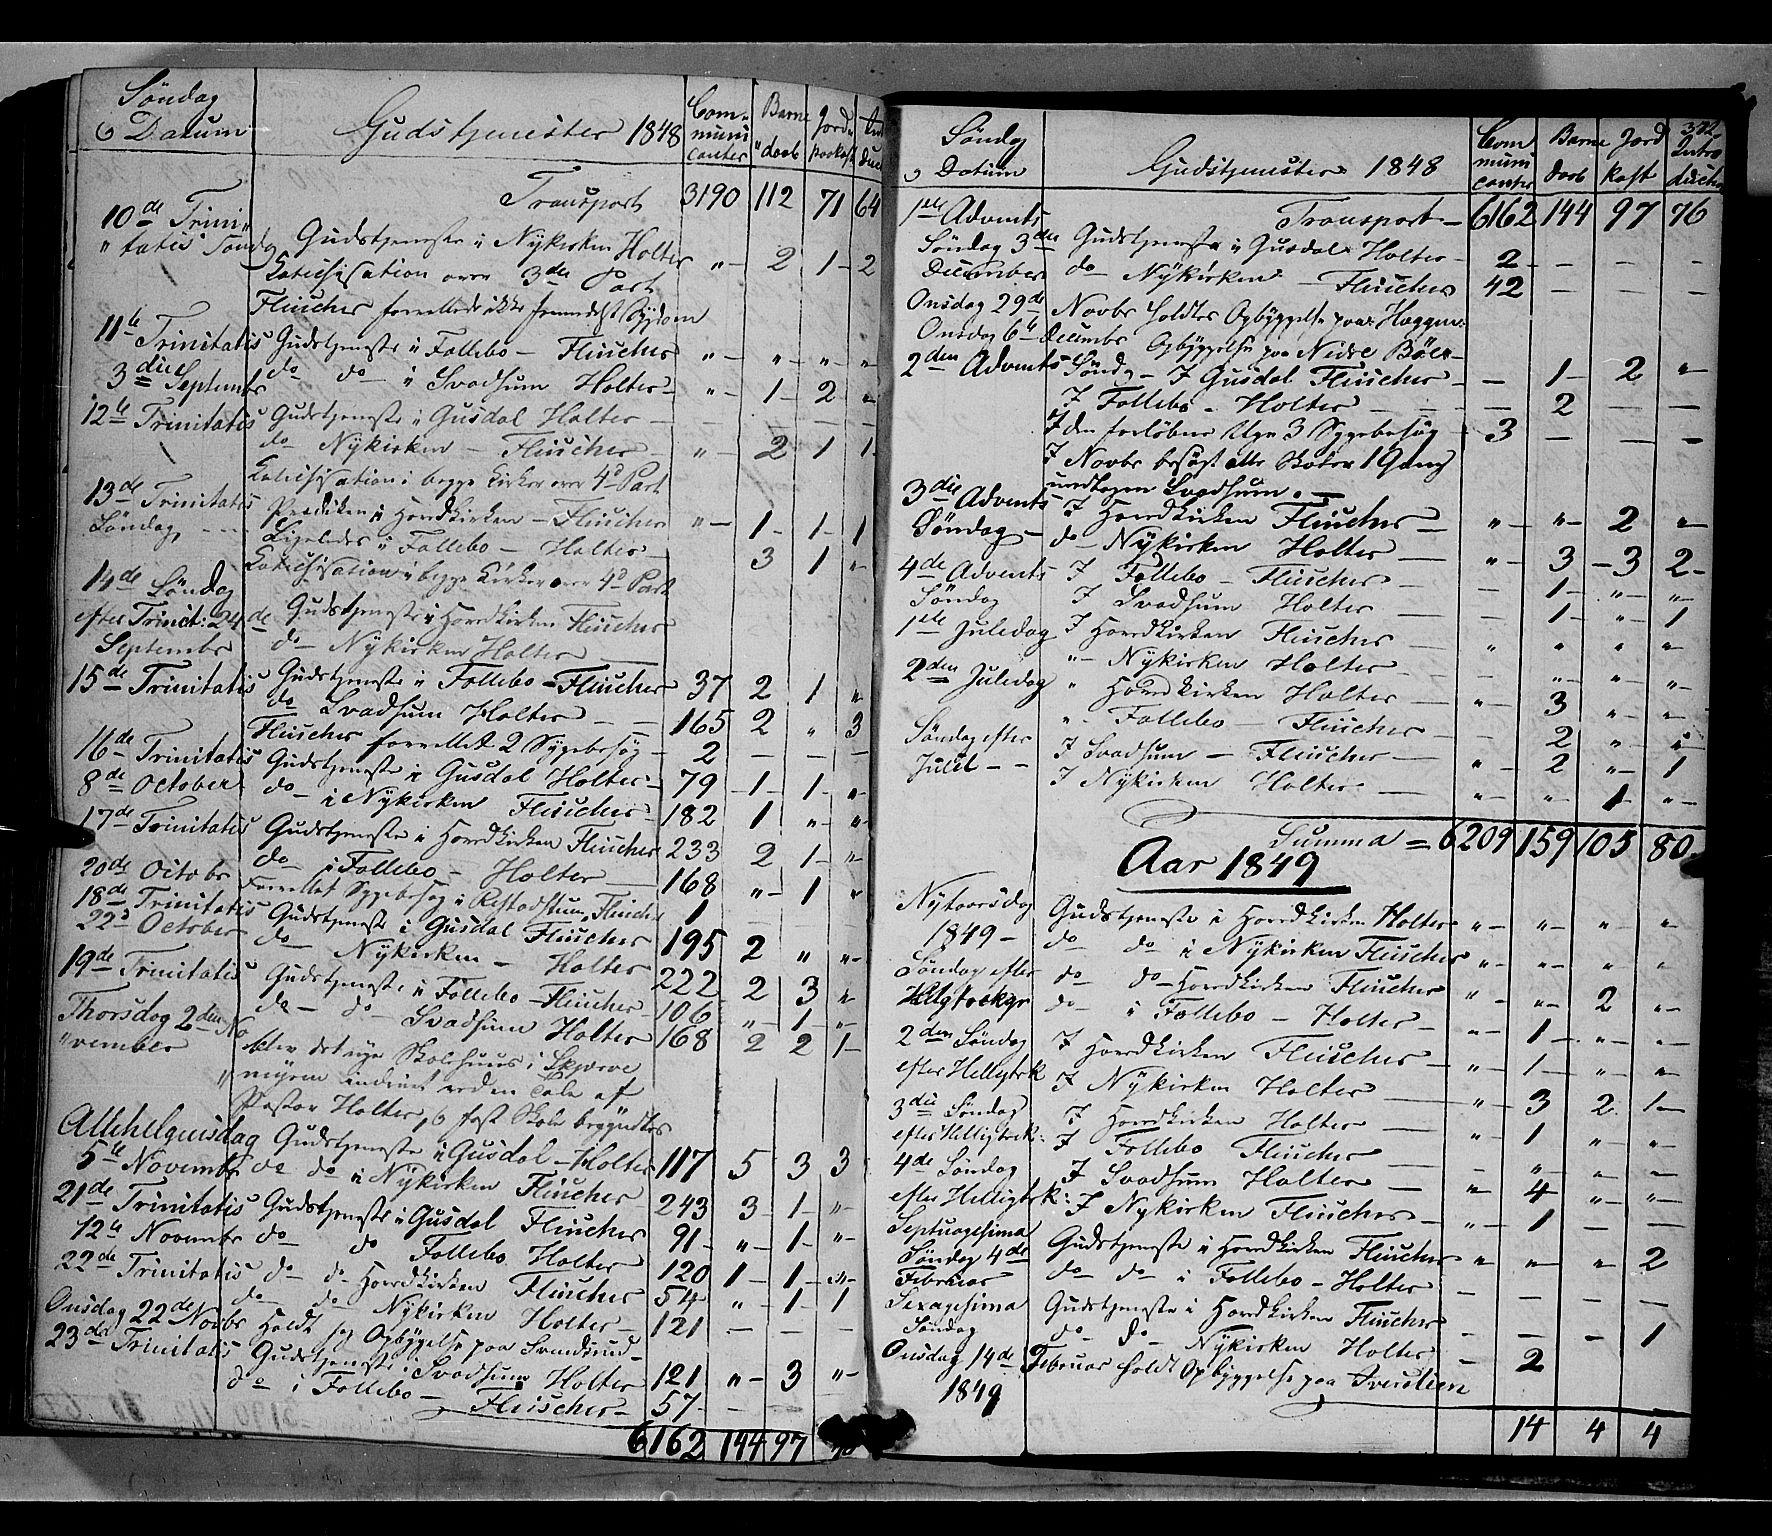 SAH, Gausdal prestekontor, Ministerialbok nr. 7, 1840-1850, s. 372